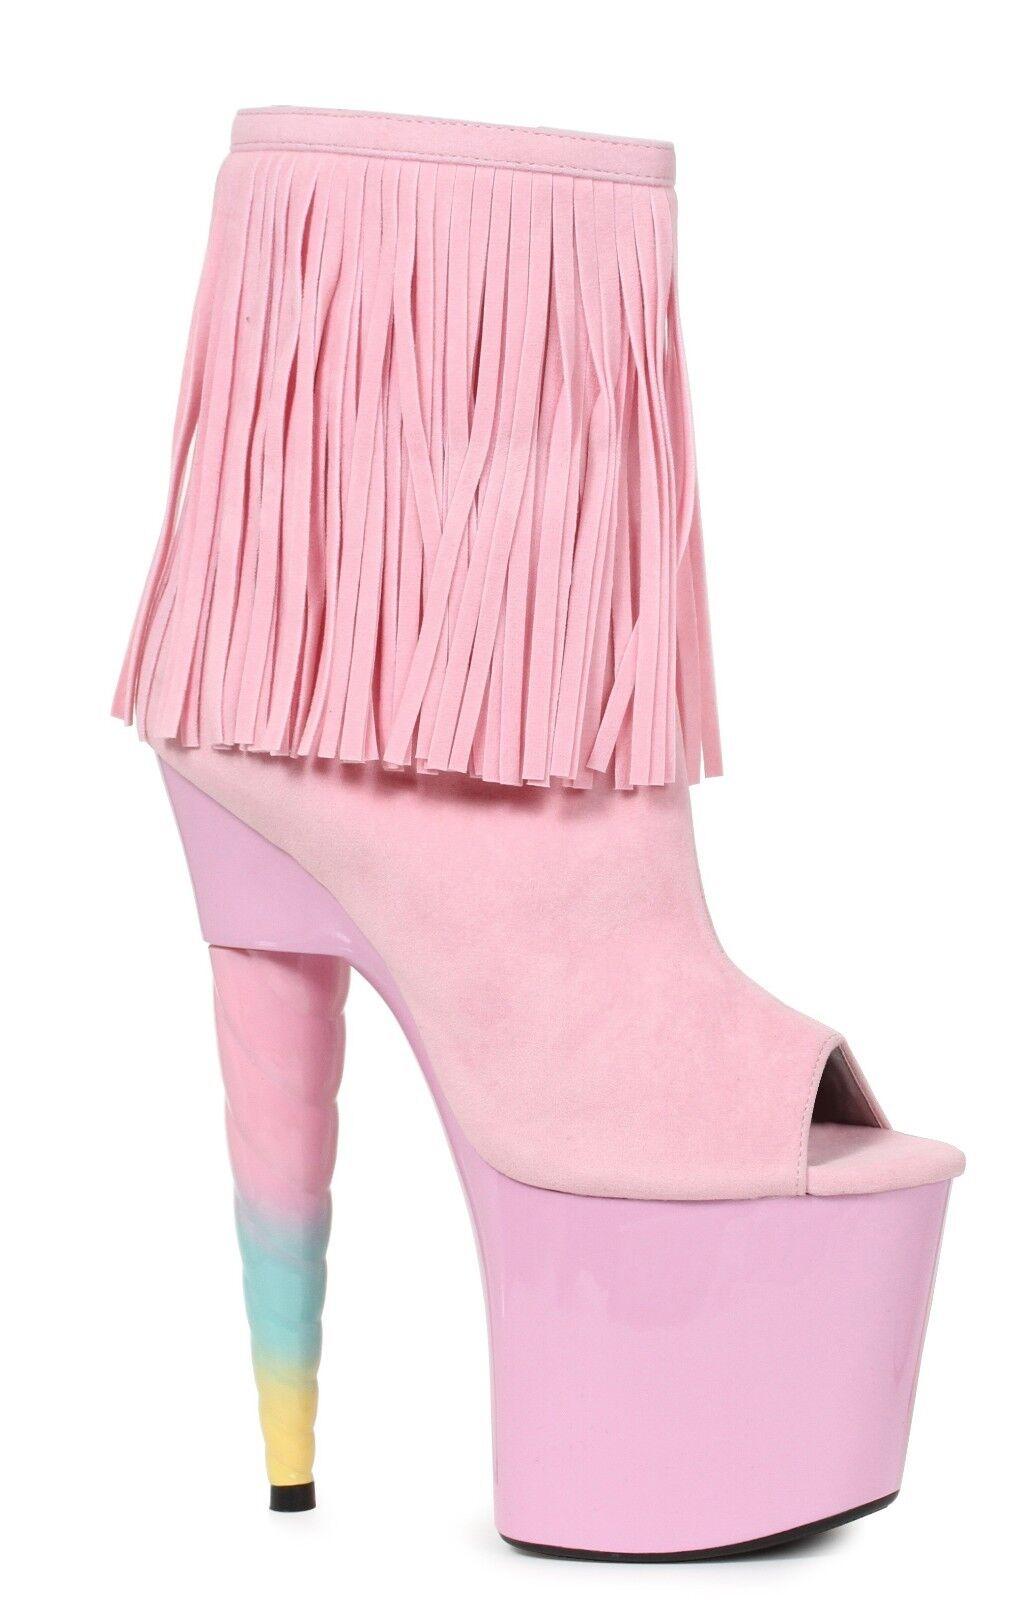 Pink Tassels Unicorn My Little Pony Cosplay Stripper Stripper Stripper Heels shoes size 6 7 8 9 10 aee40a